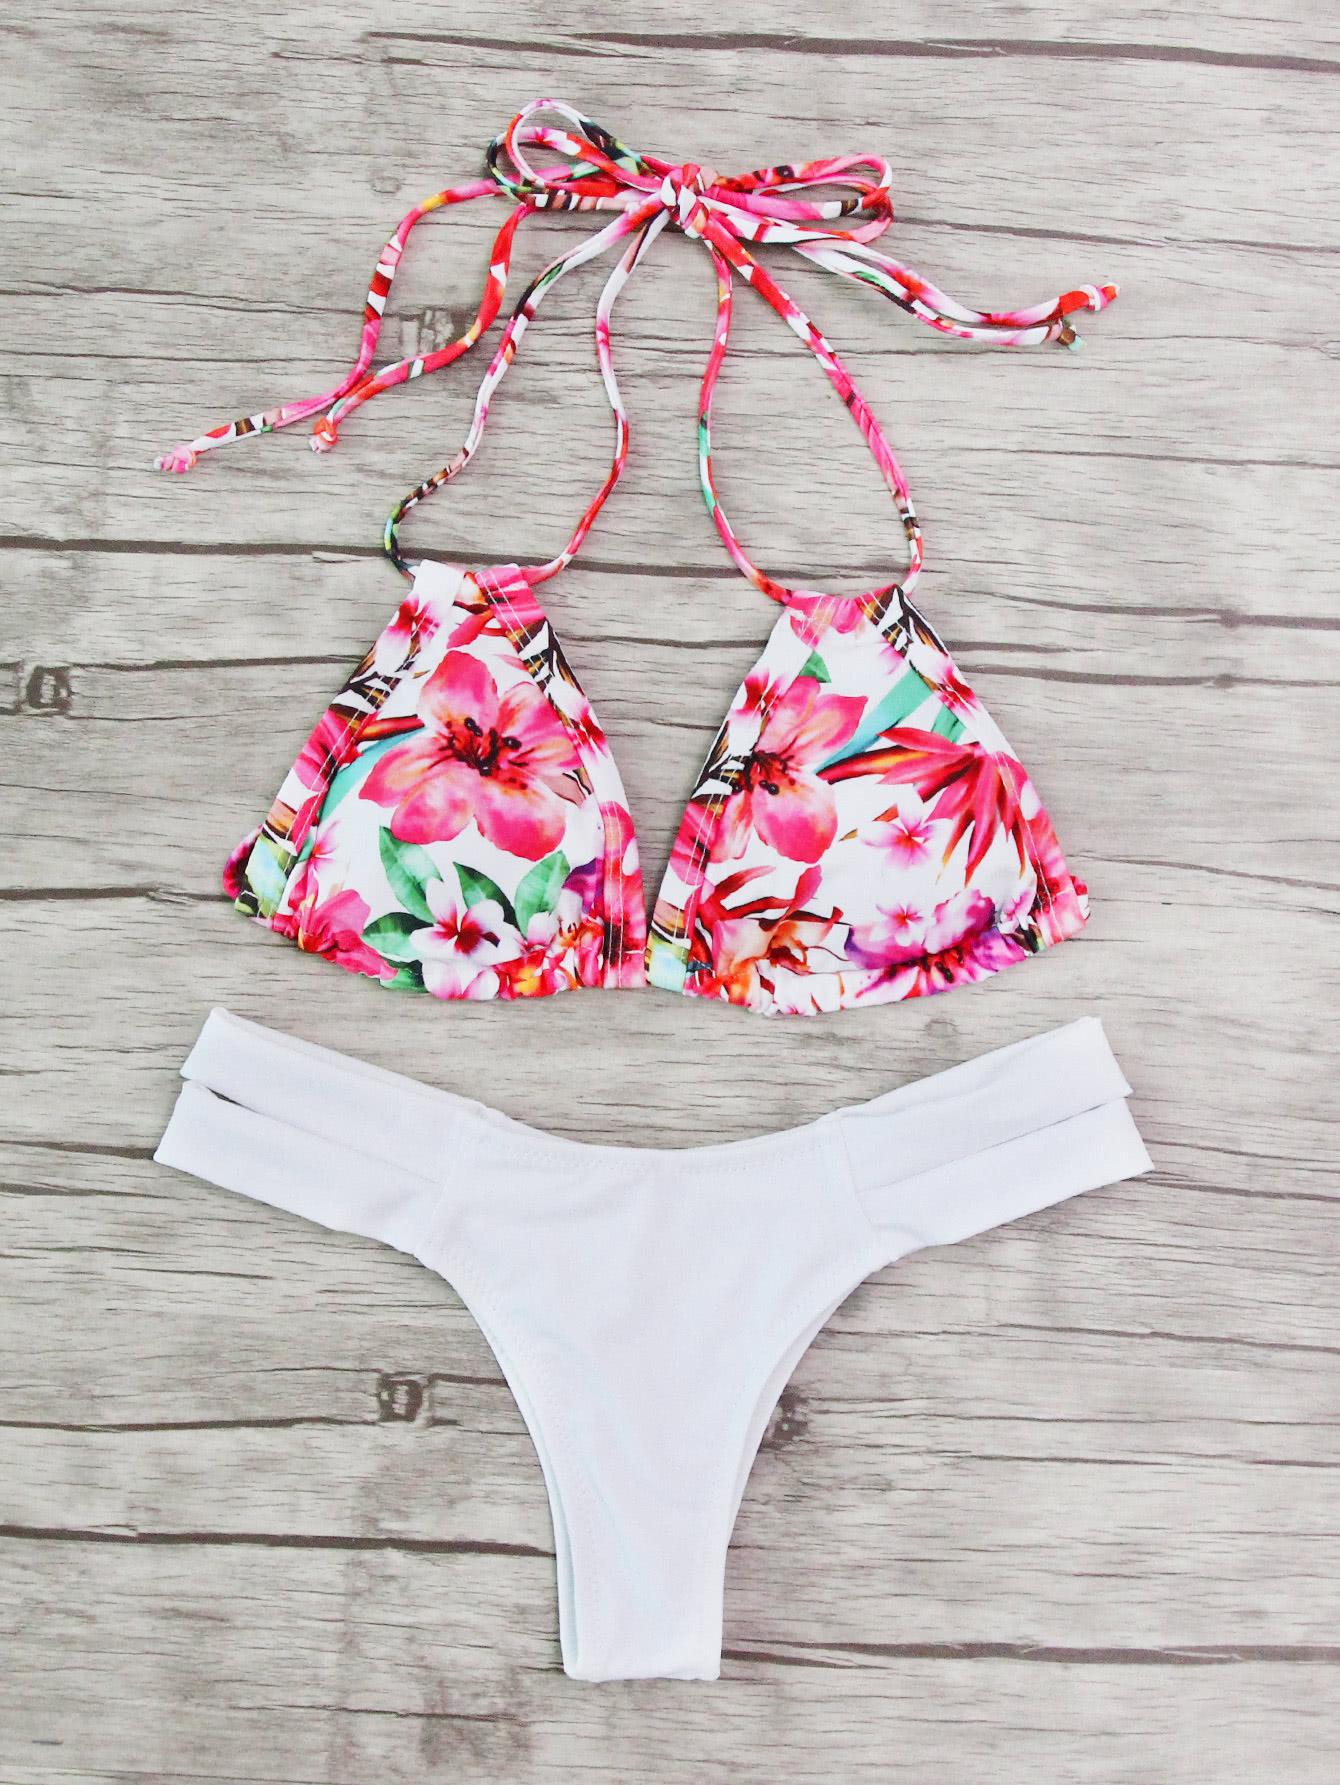 Calico Print Mix & Match Halter Bikini Set swimwear170605304